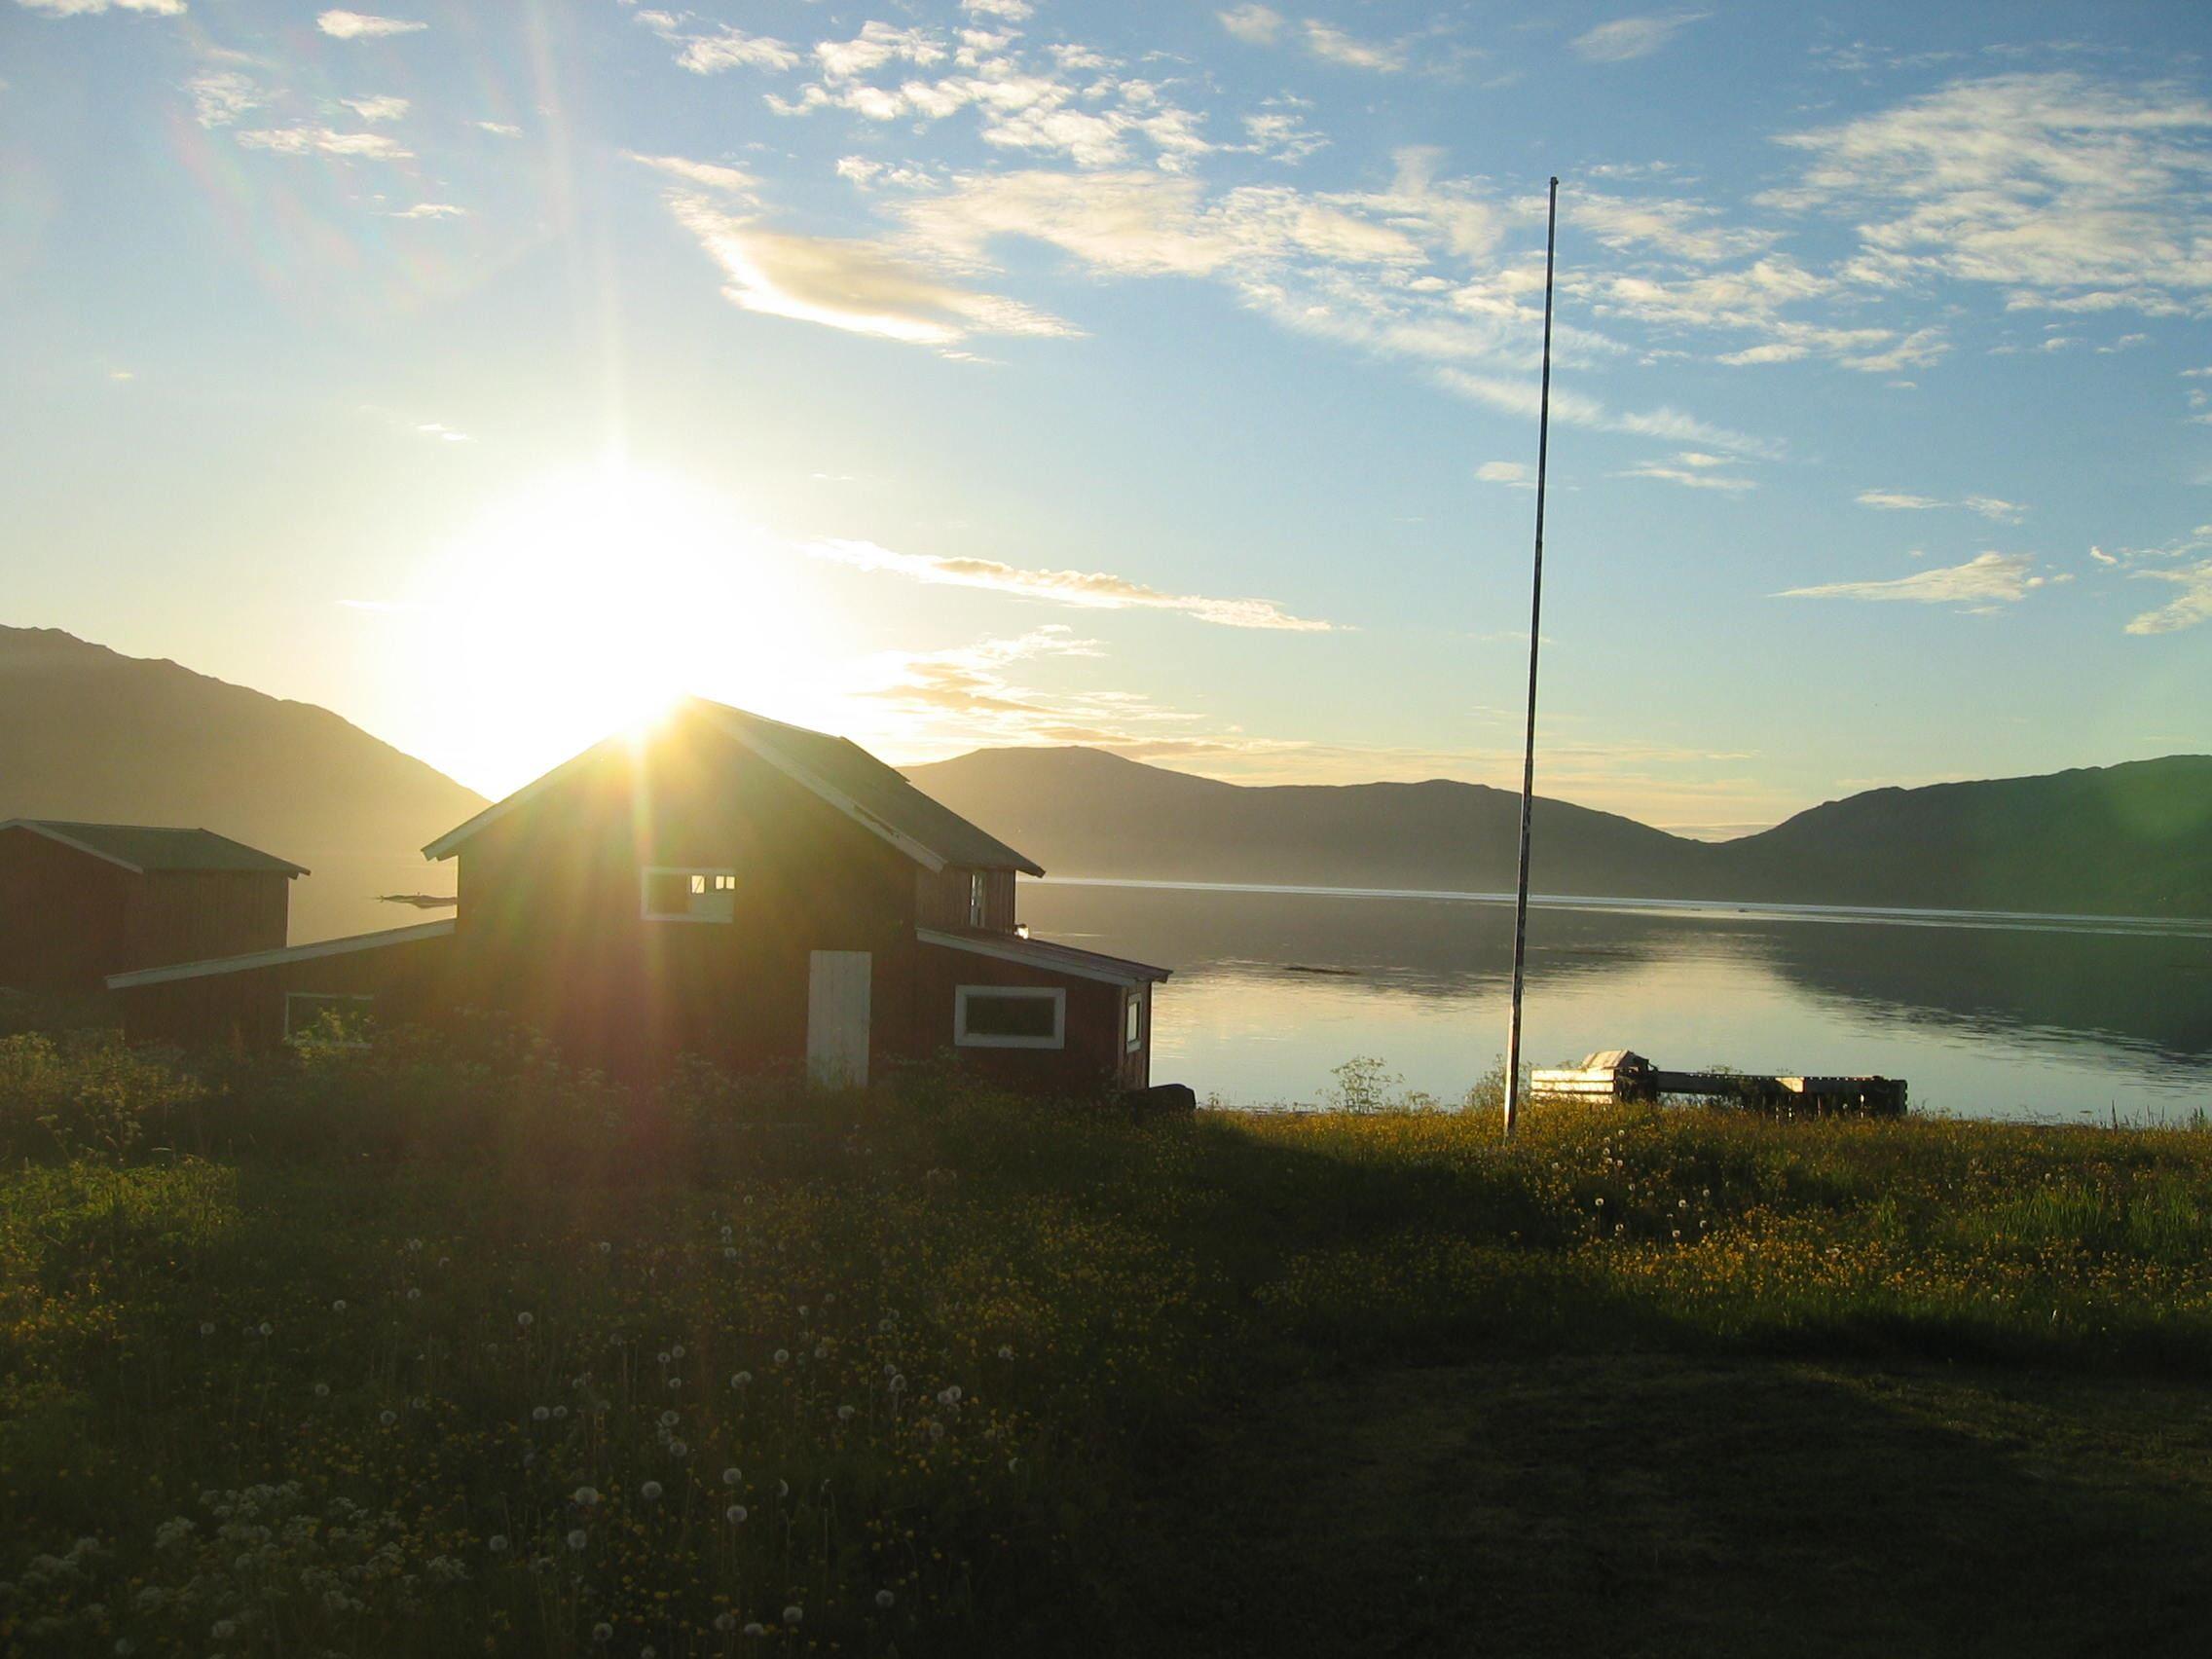 En smak av nordnorsk sjømat med RIB-båt – Tromsø Friluftsenter